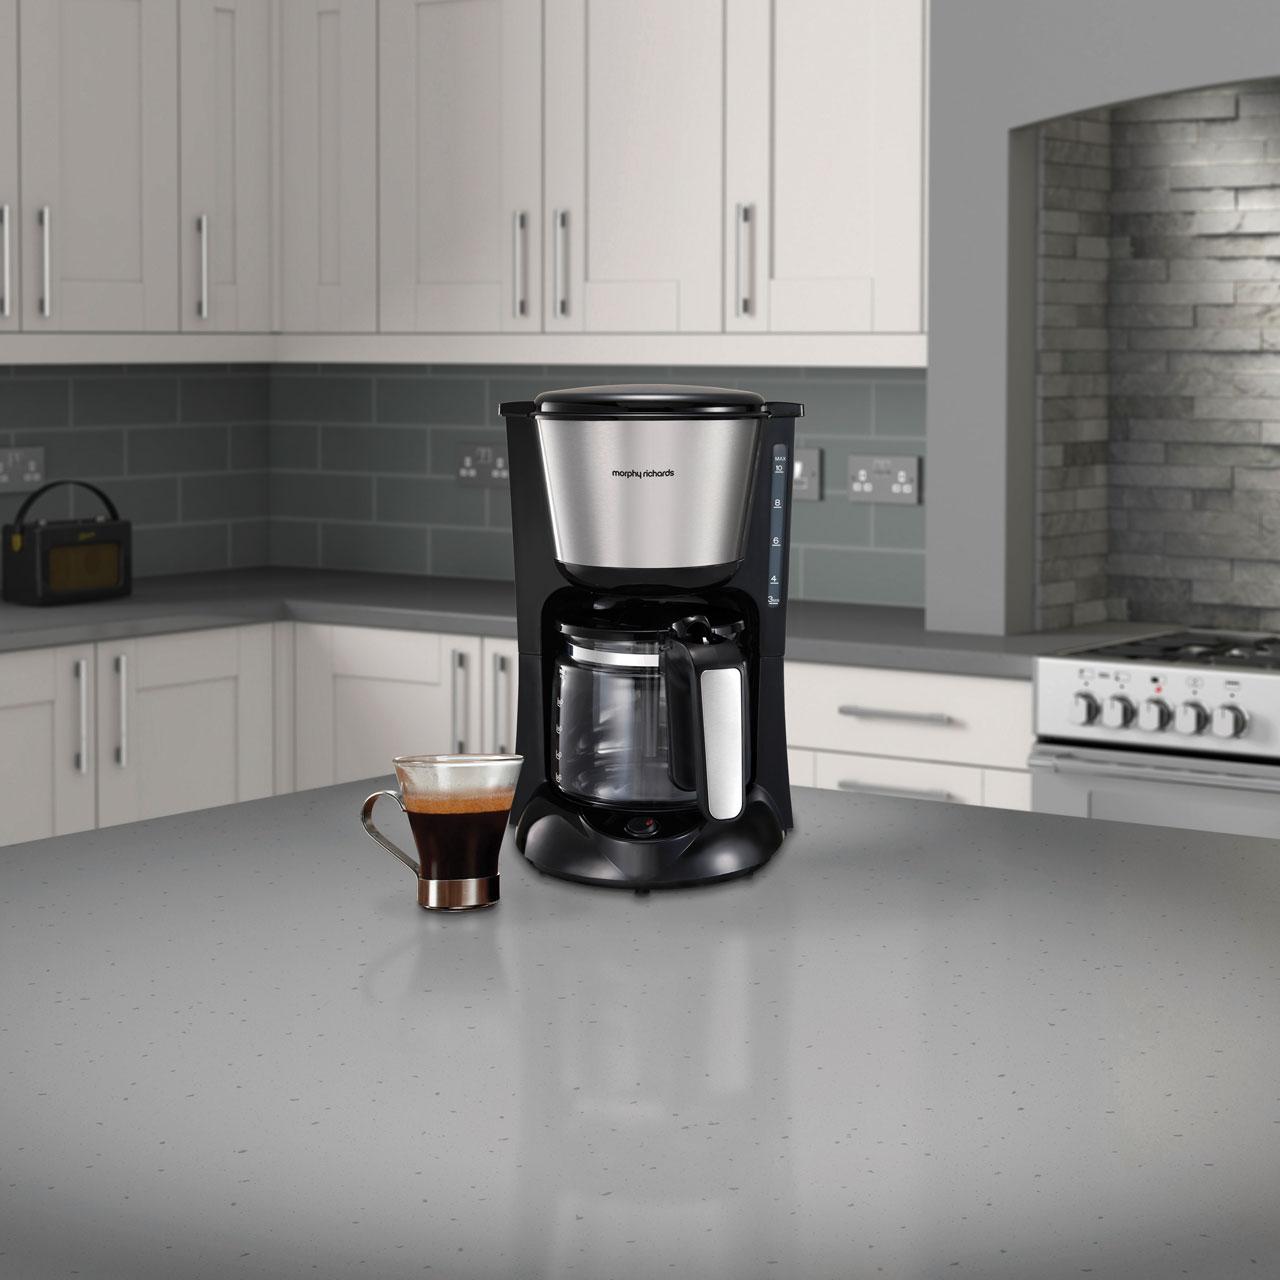 Morphy Richards Equip 162501 Filter Coffee Machine Black Brushed Steel